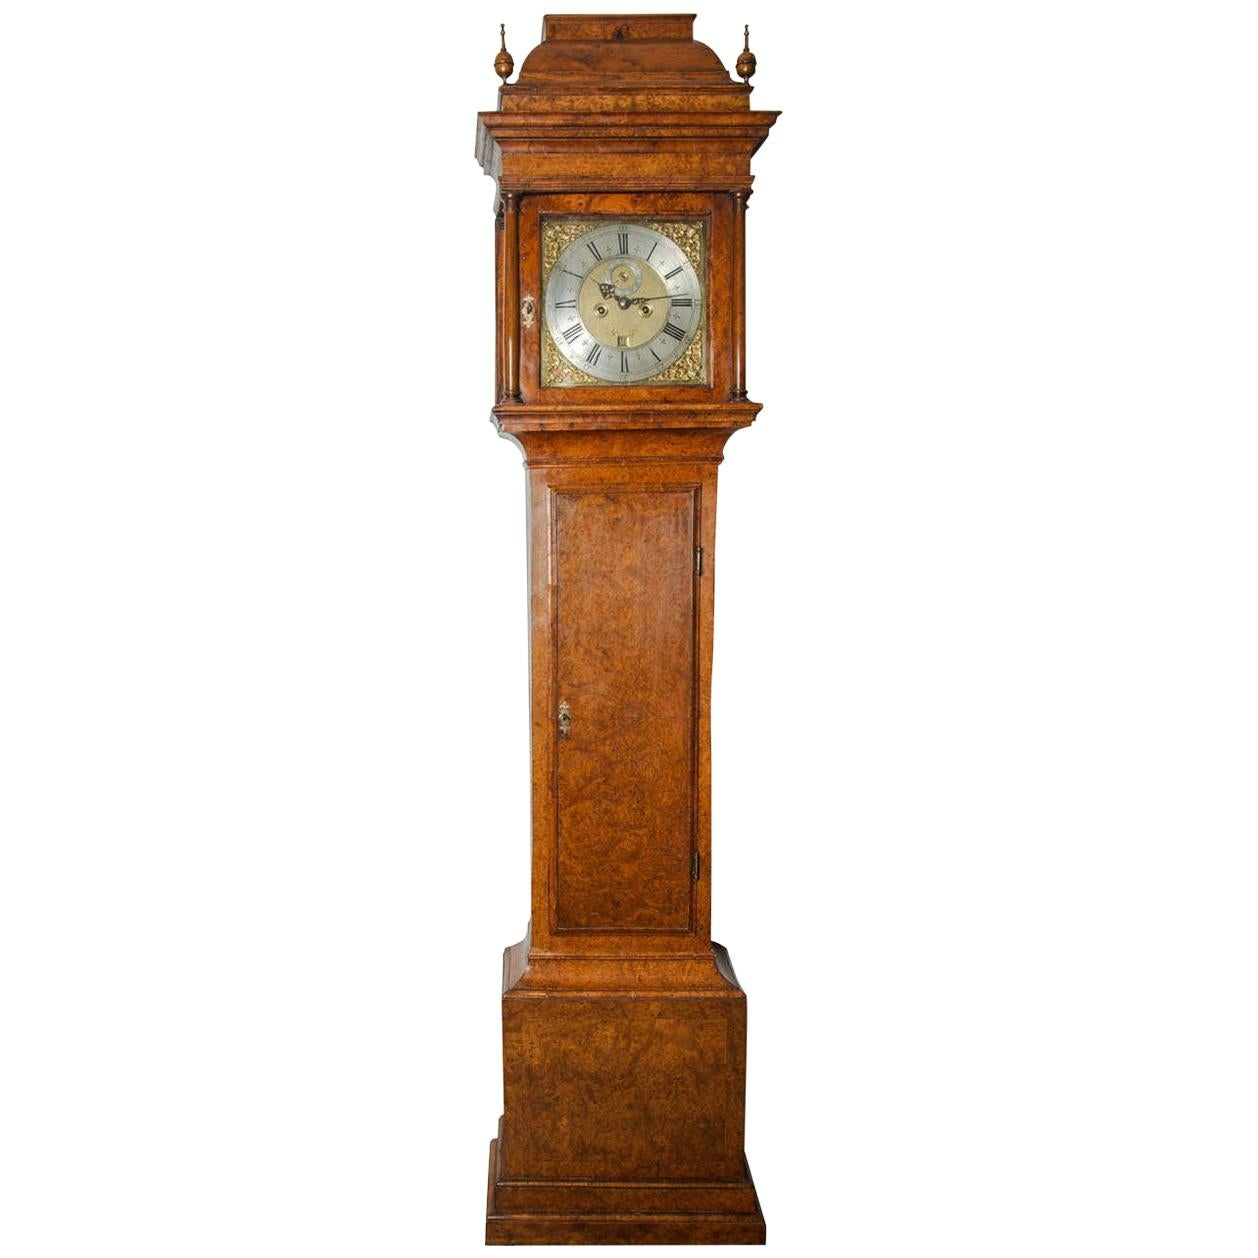 18th Century Antique Burr-Yew Longcase Clock by John Stephens of London